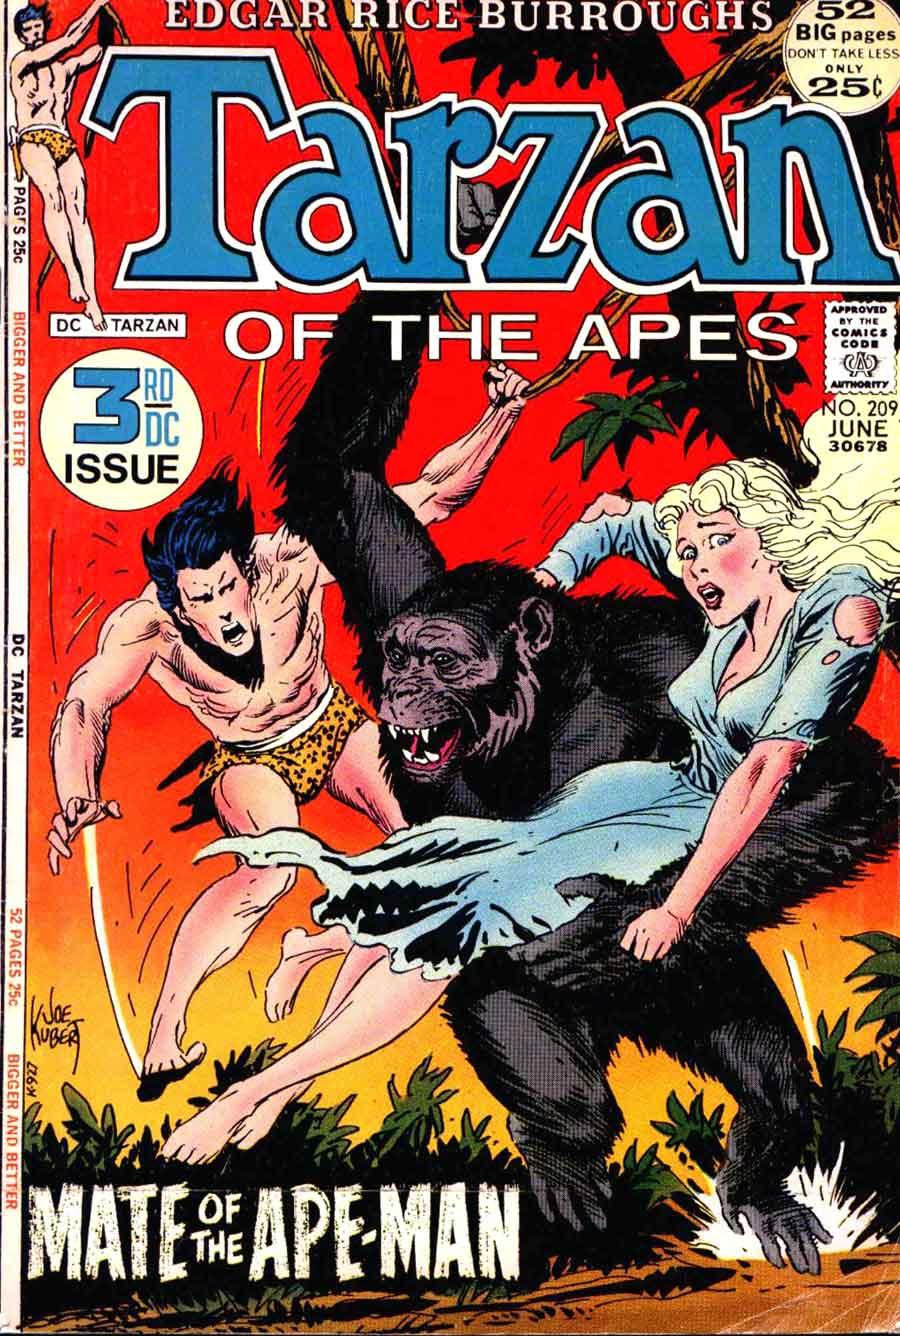 Tarzan v1 #209 dc comic book cover art by Joe Kubert